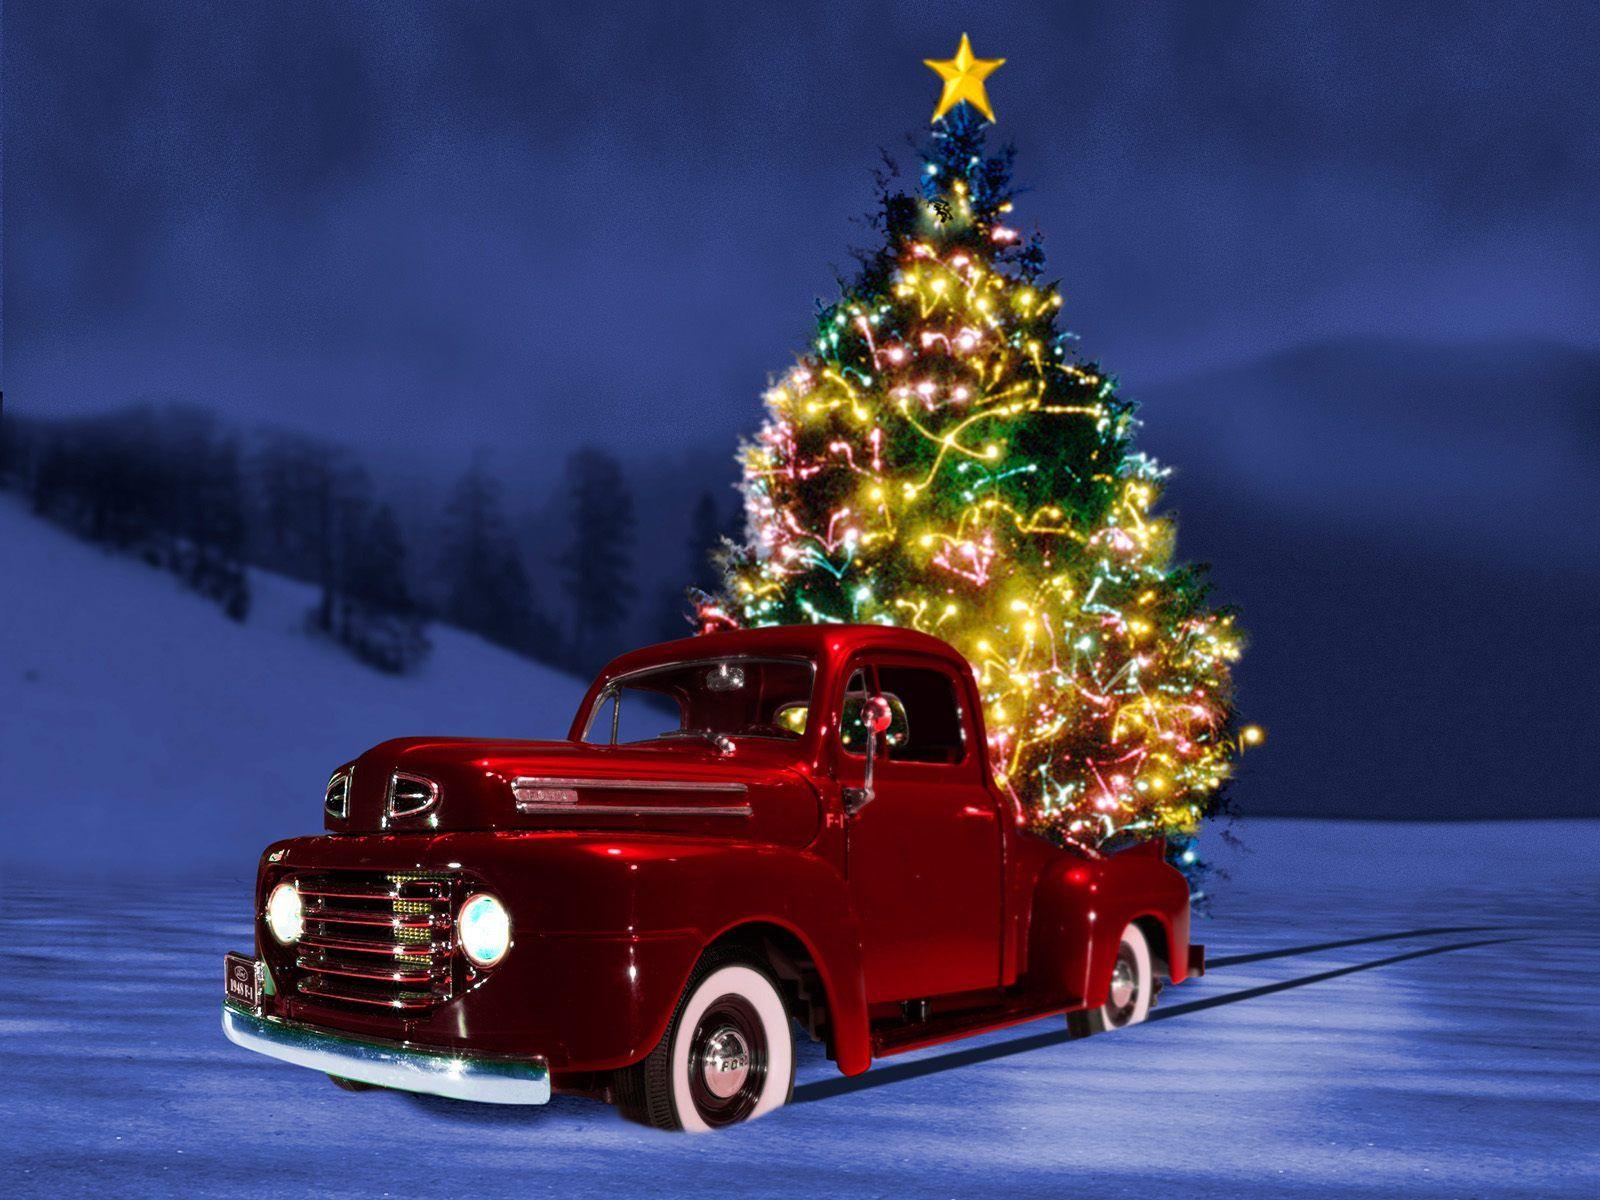 Christmas Tree Christmas Truck Christmas Wallpaper Backgrounds Country Christmas